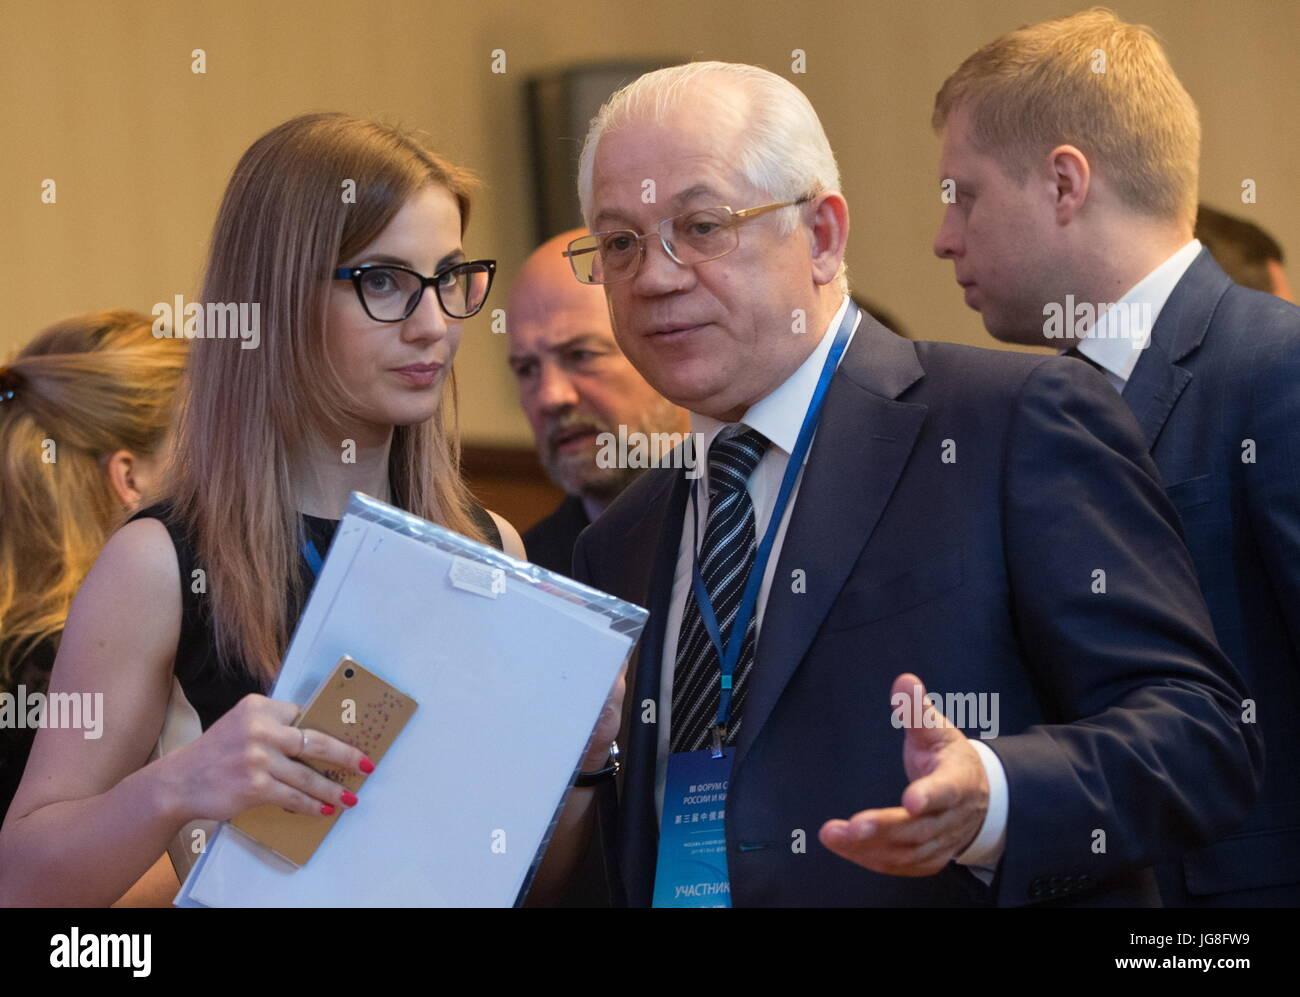 MOSCOW, RUSSIA – JULY 4, 2017: Pavel Negoitsa (C), General Director of the state-run Rossiyskaya Gazeta newspaper, - Stock Image